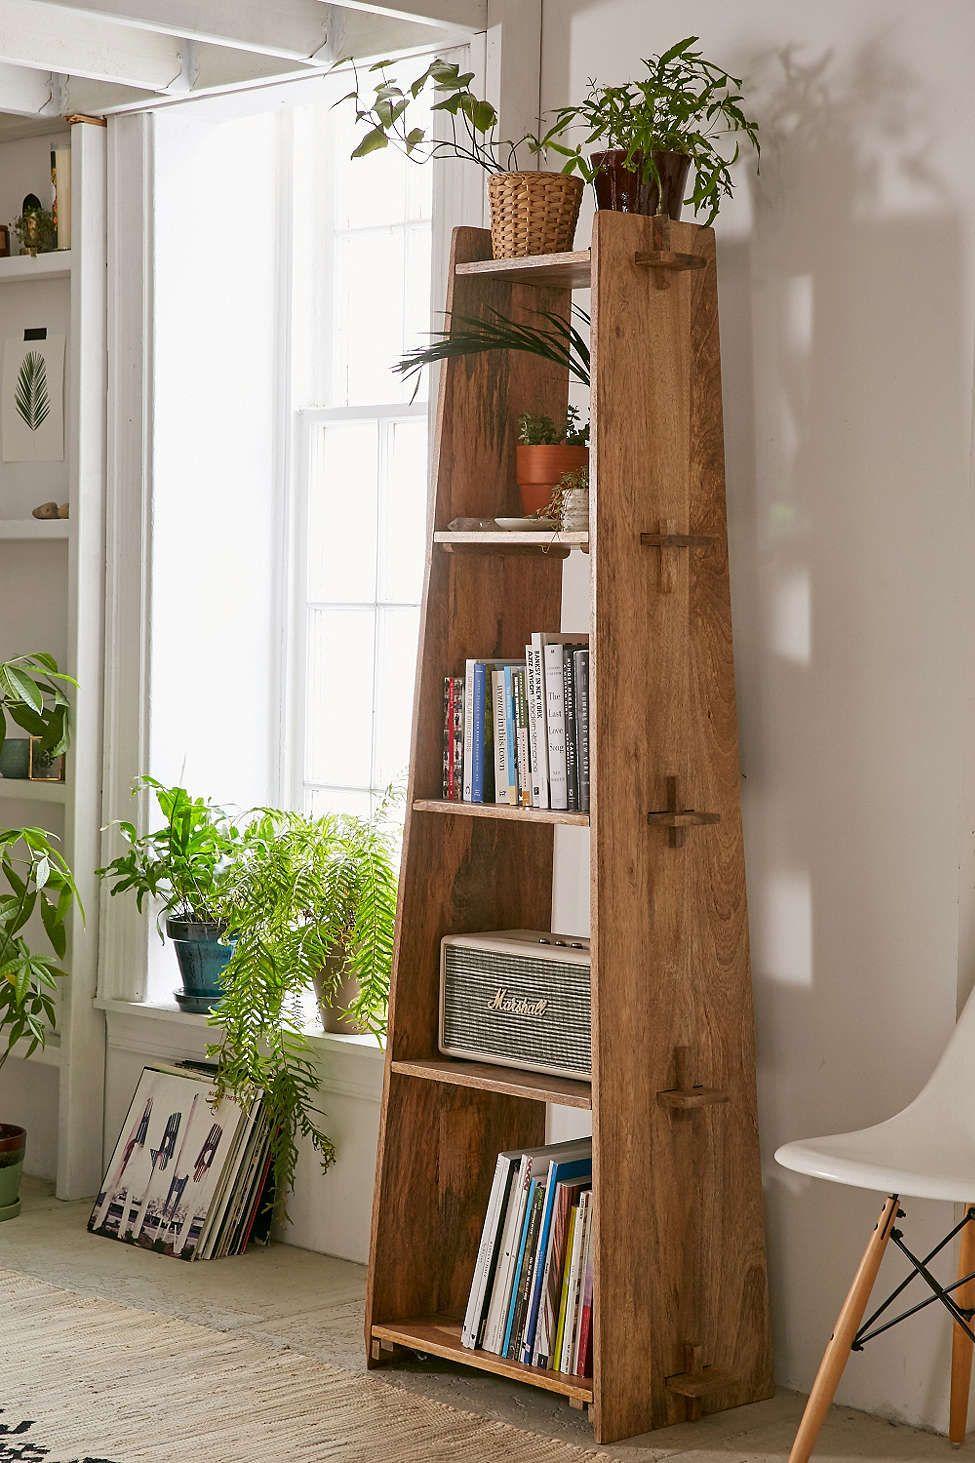 Benton Wood Shelf Shelves Diy Furniture Wood Shelves